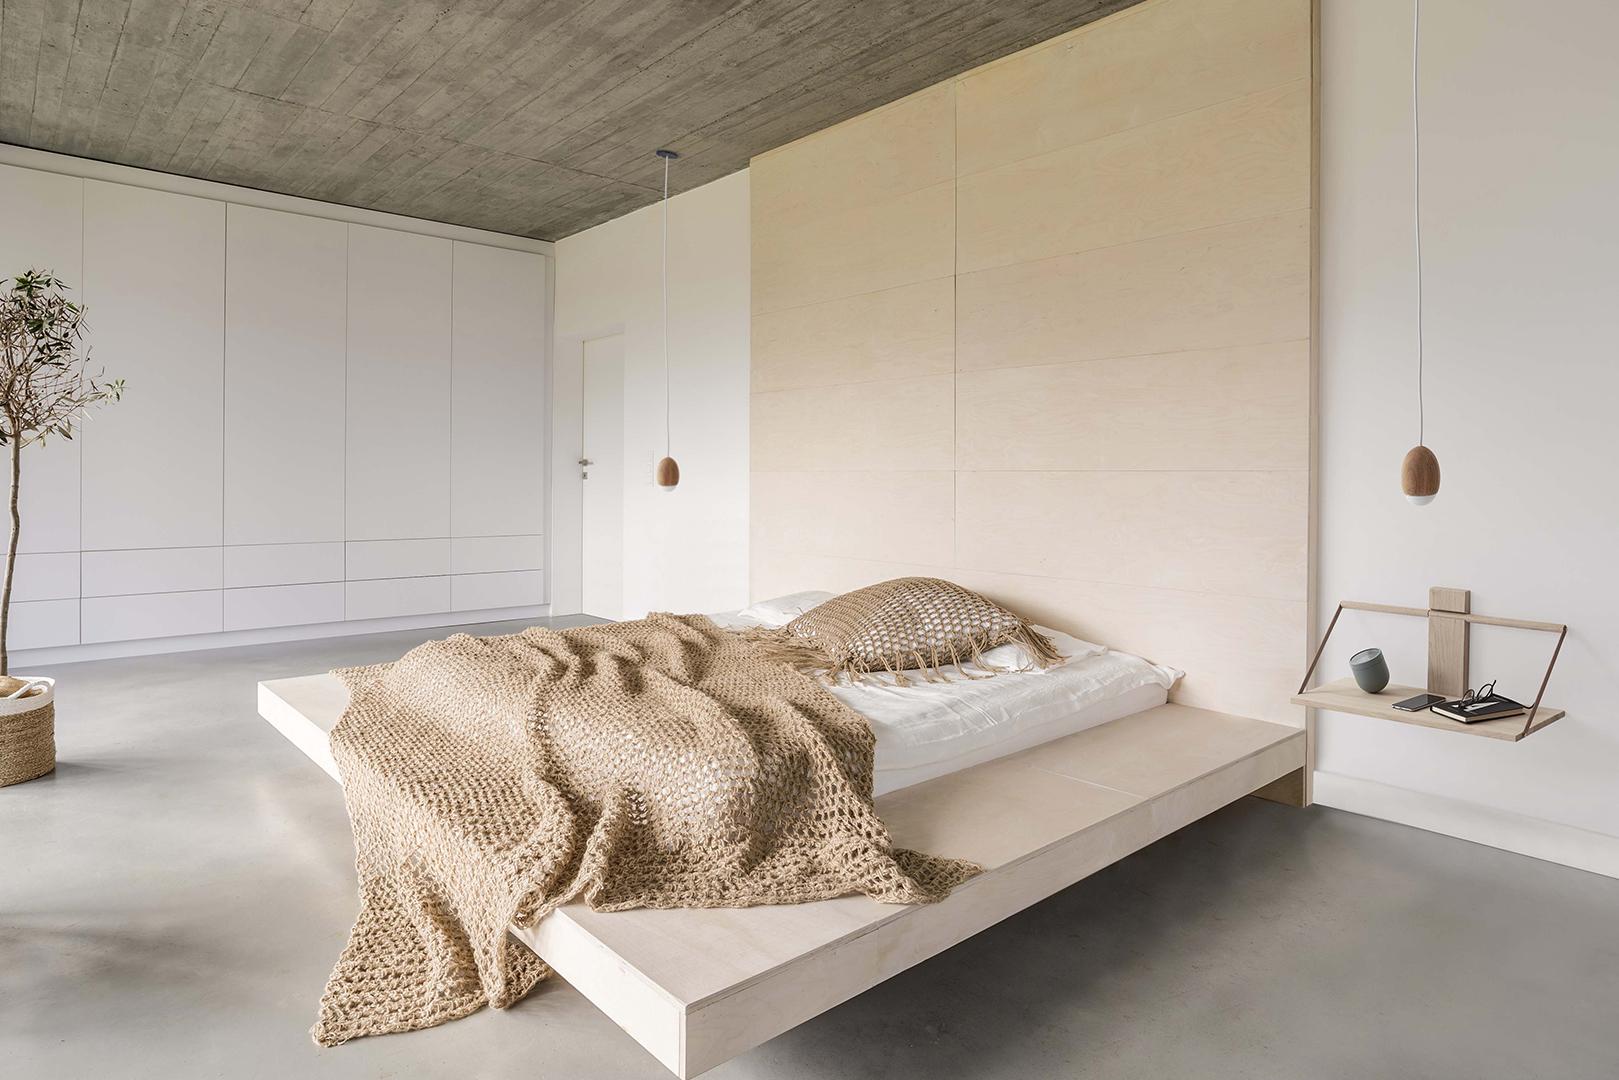 shelf-wood-wall-galleri.jpg